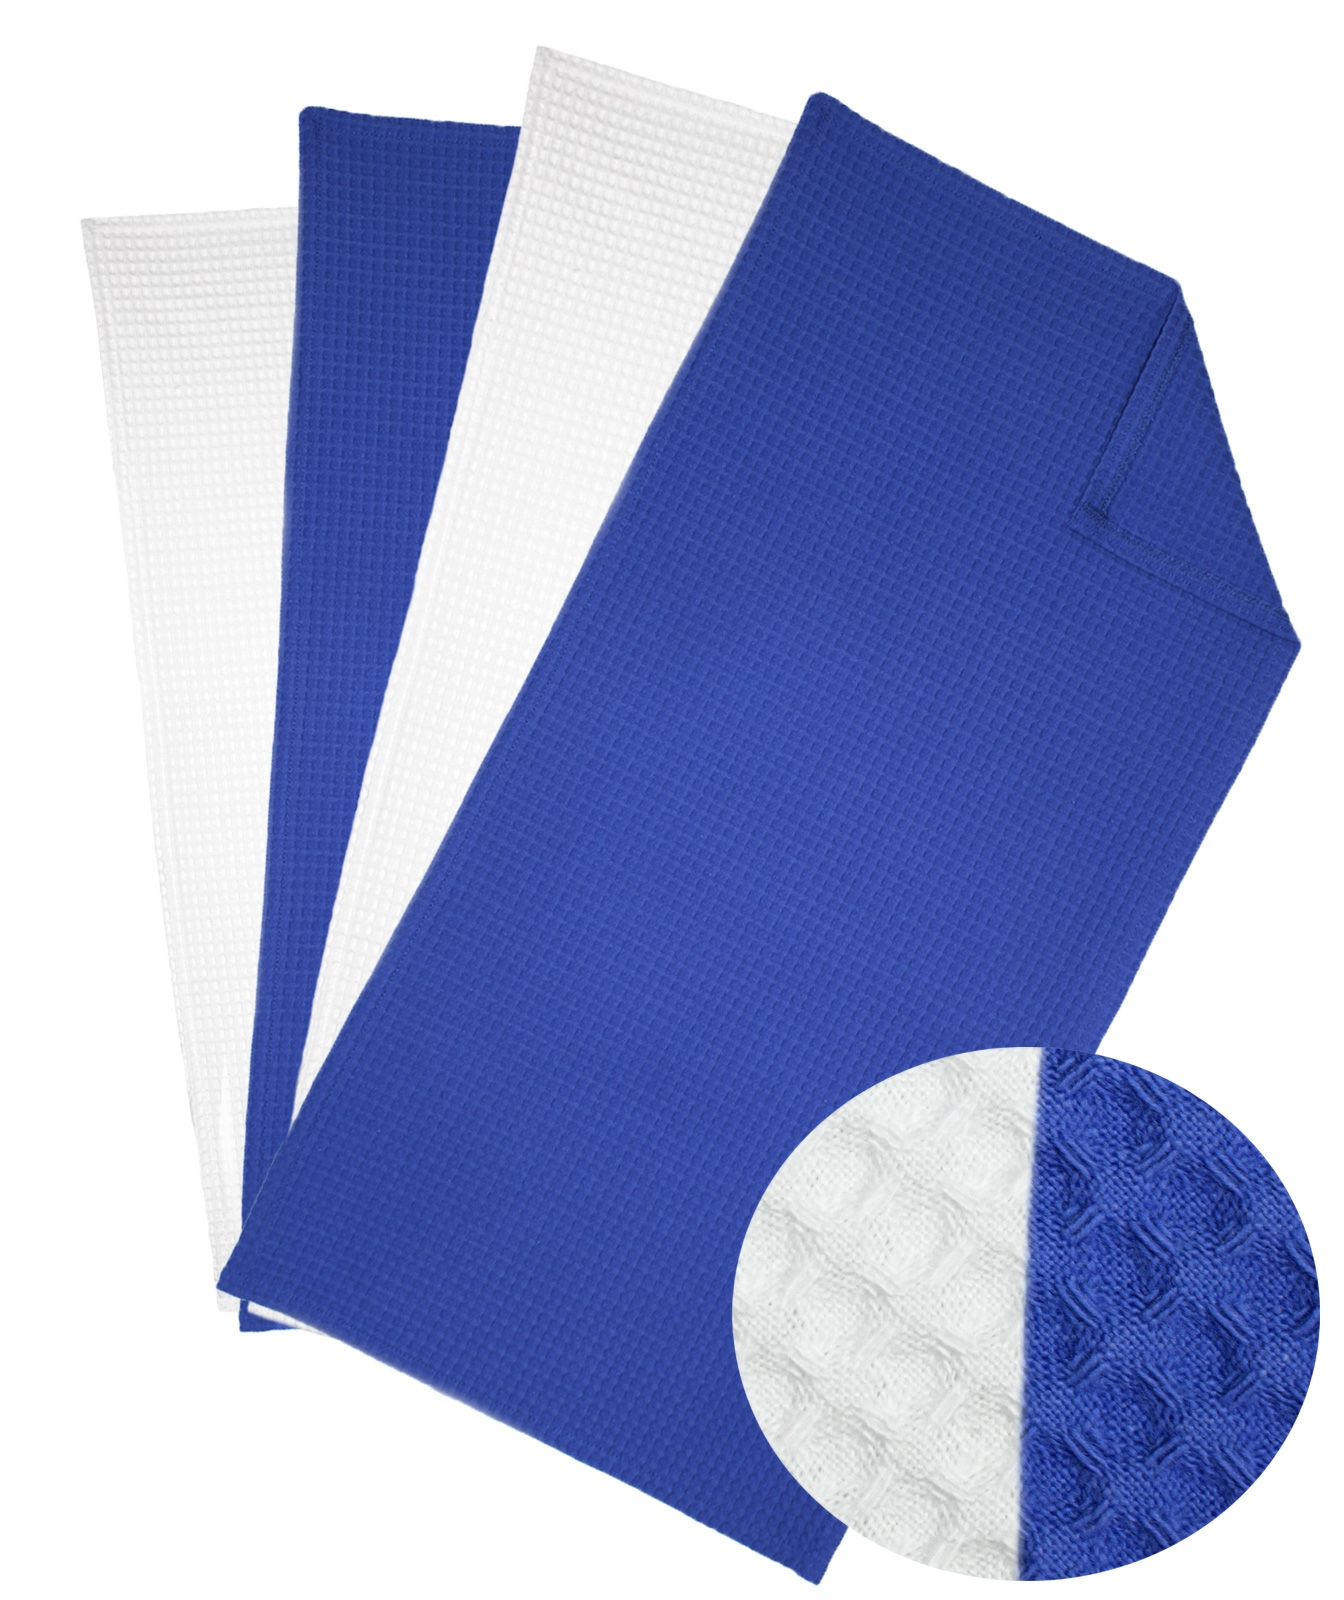 Küchentextilien - 6er Pack excellence Geschirrtücher Waffel Pique Küchenhandtuch 40x80 cm  - Onlineshop PremiumShop321